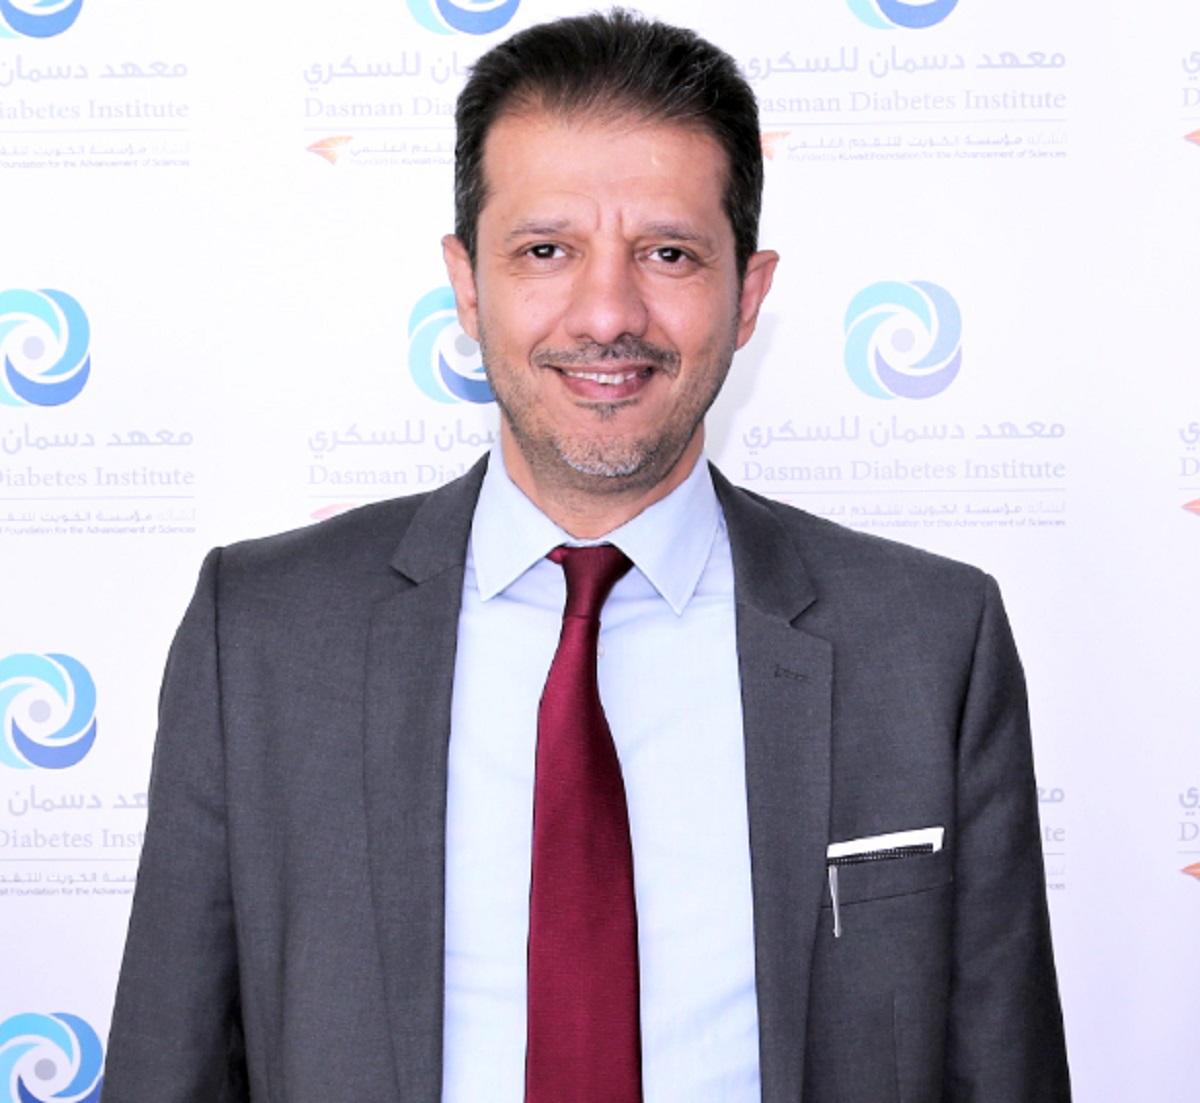 Dr Jehad Abubakr